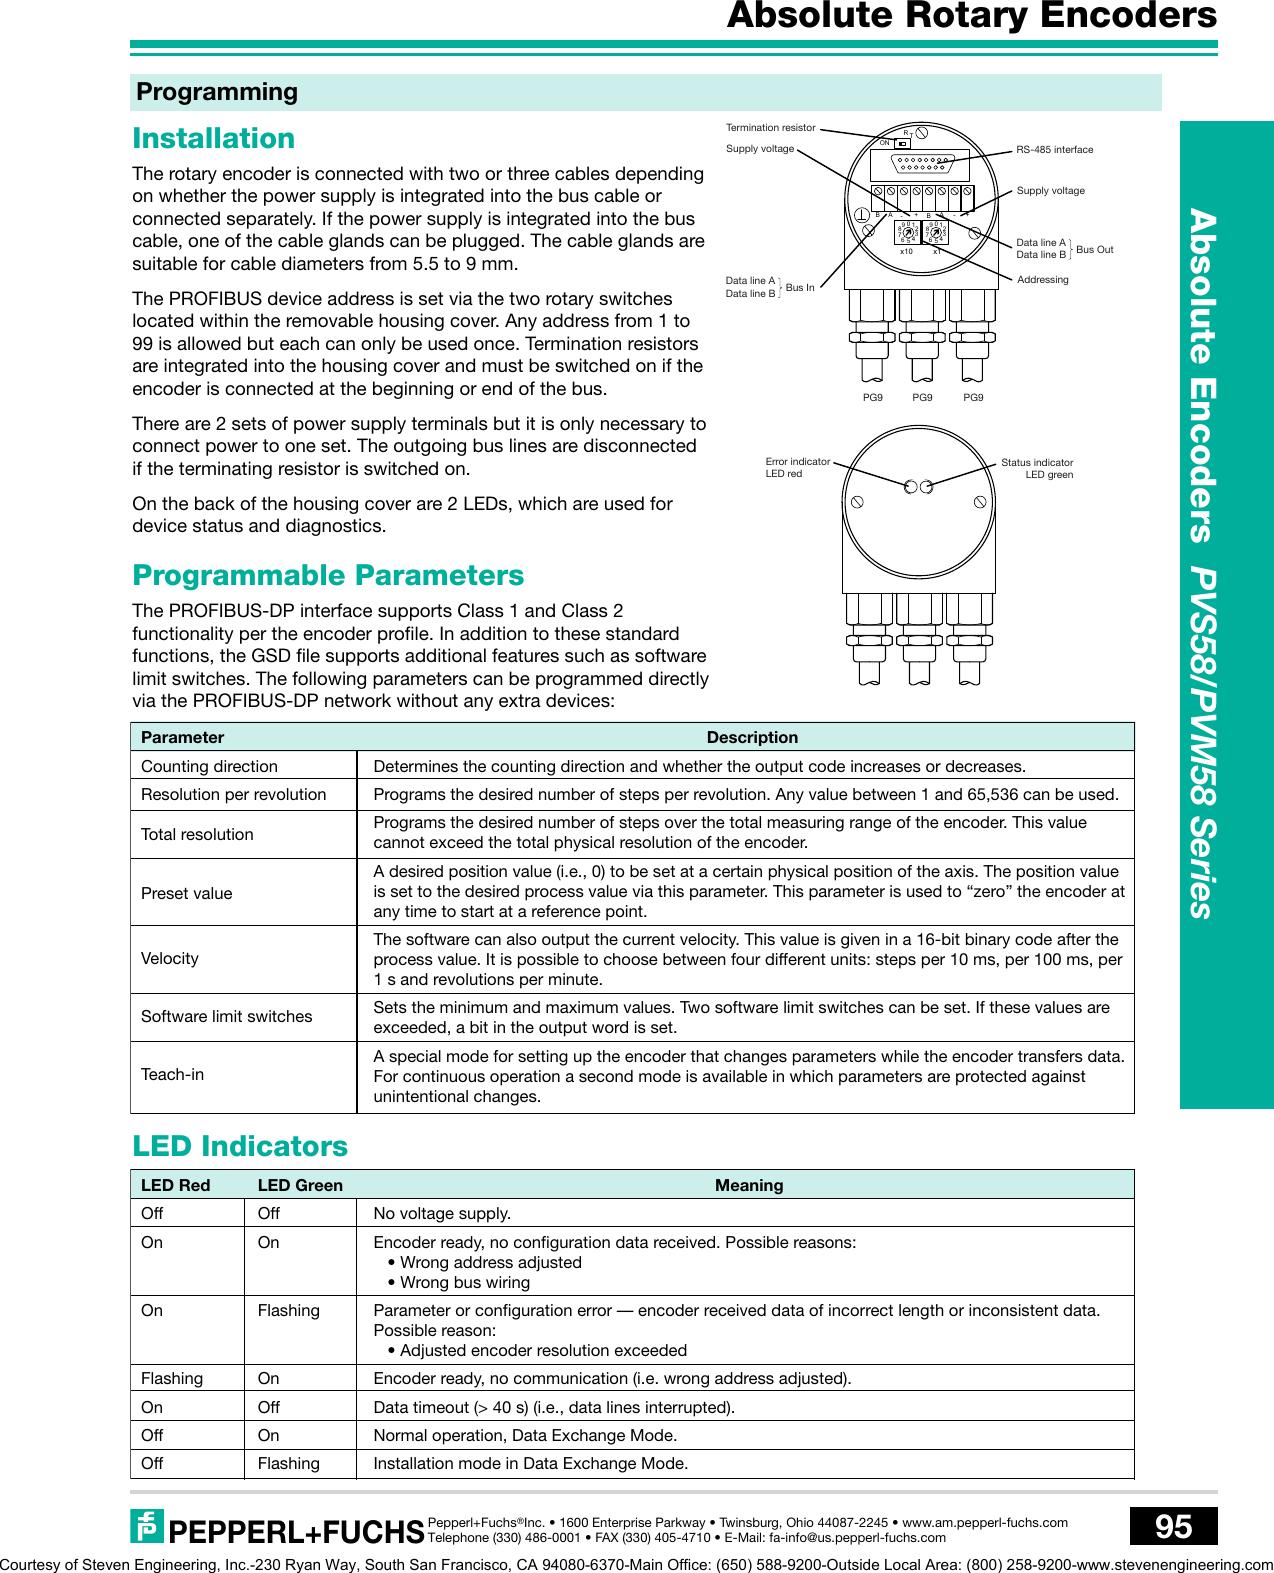 Rotary Encoder Catalog Pepperl+Fuchs 342735